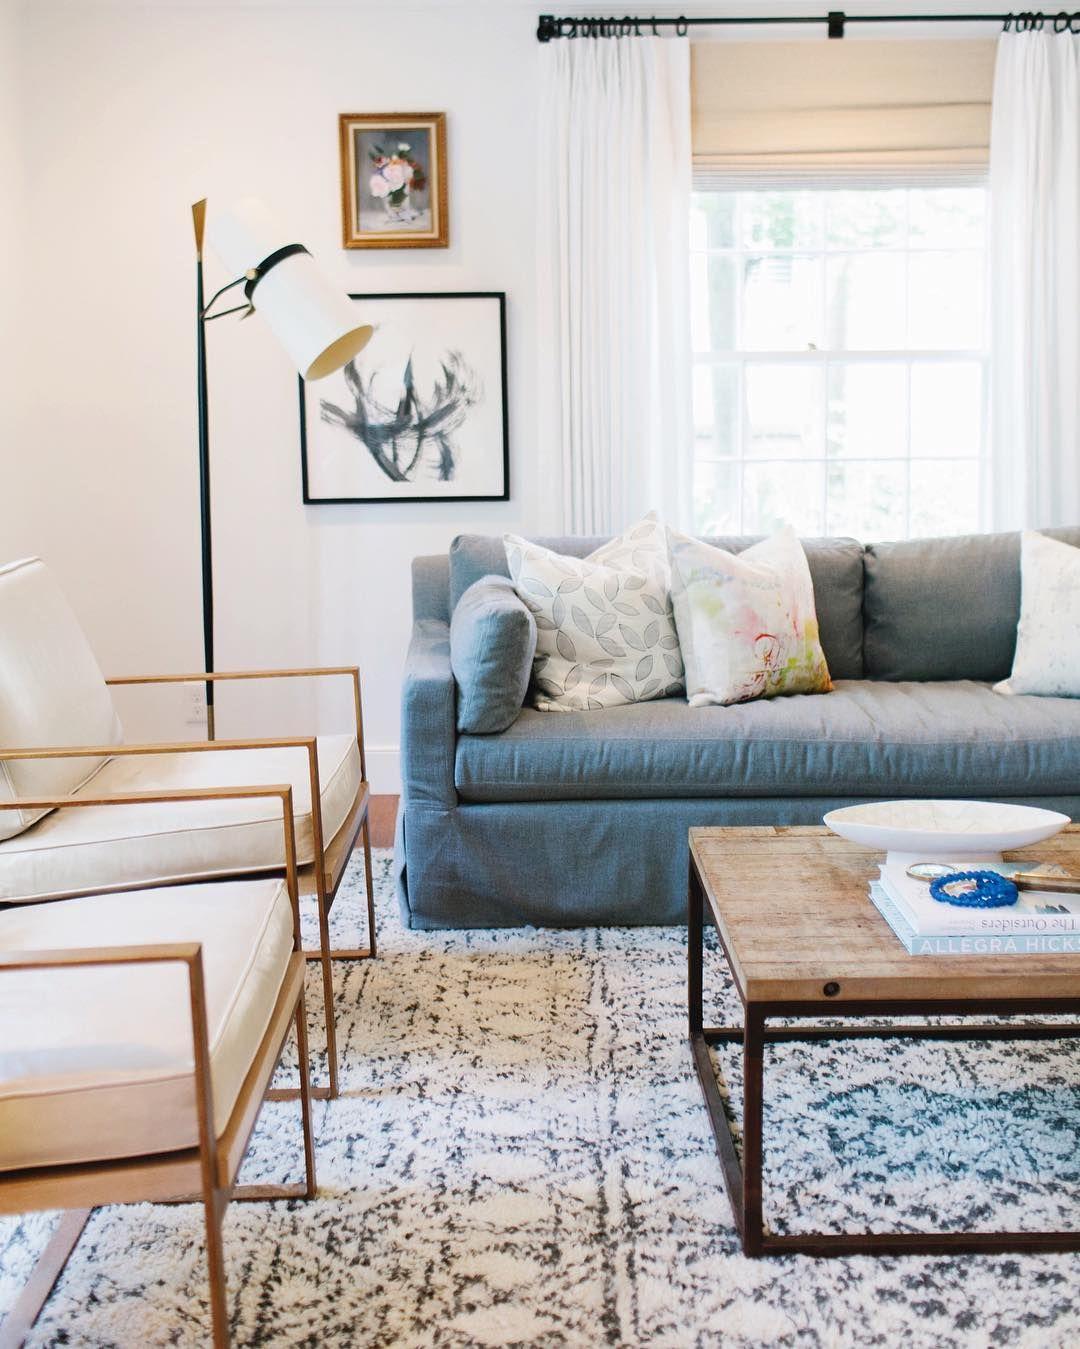 wife | mama of twins | blogger for fun | interior design lover ...